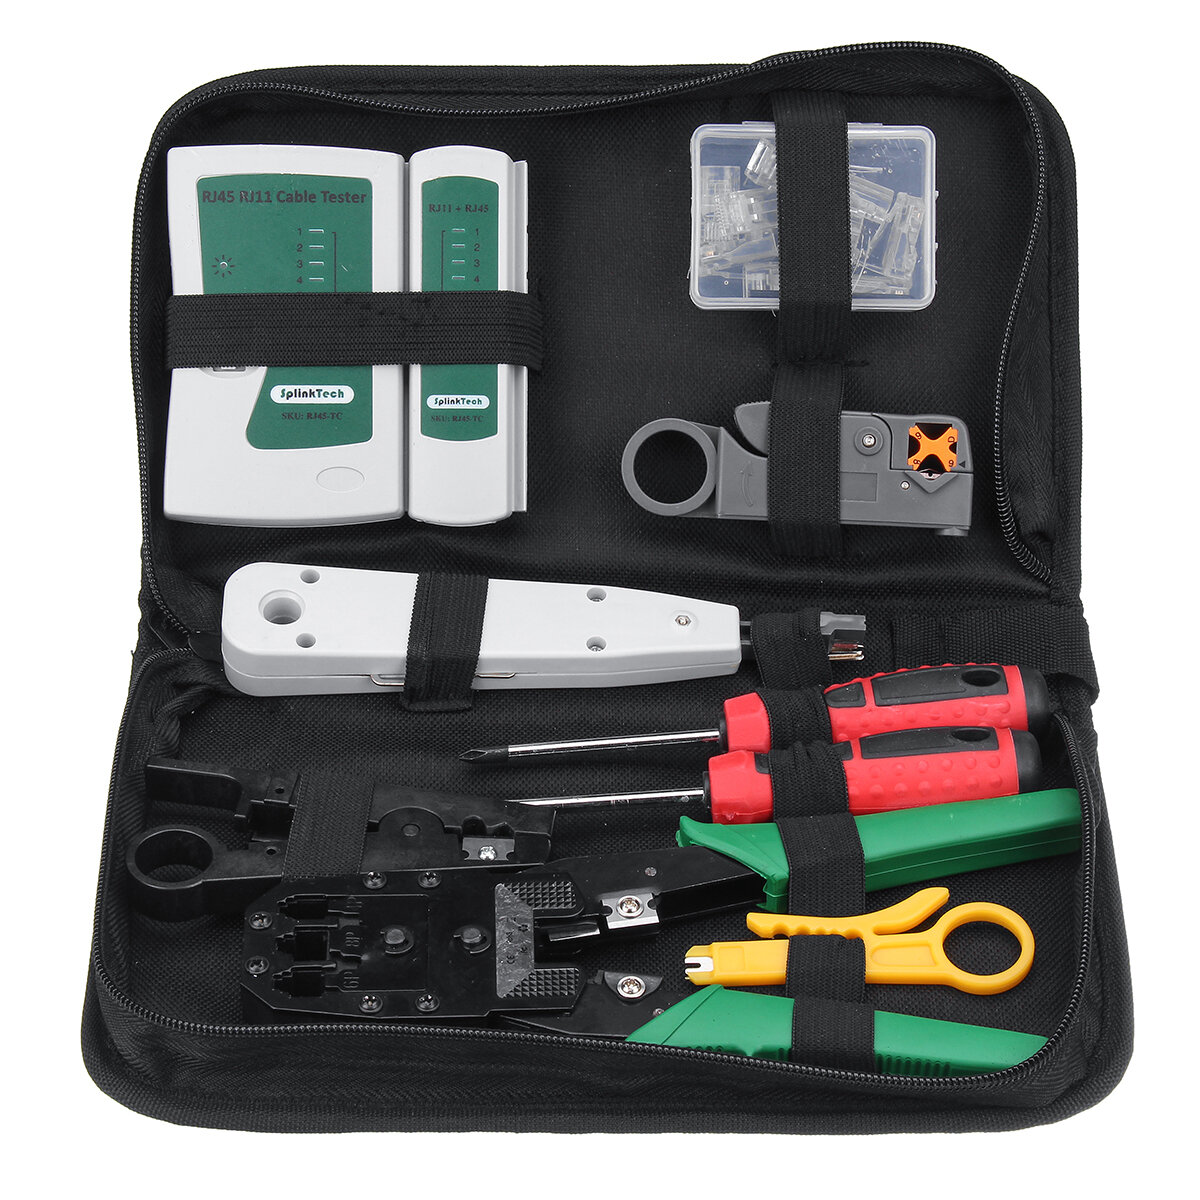 Red LAN Cable Tester Crimp Crimper Plier Kit Cat5 RJ45 RJ11 RJ45 Mano herramienta